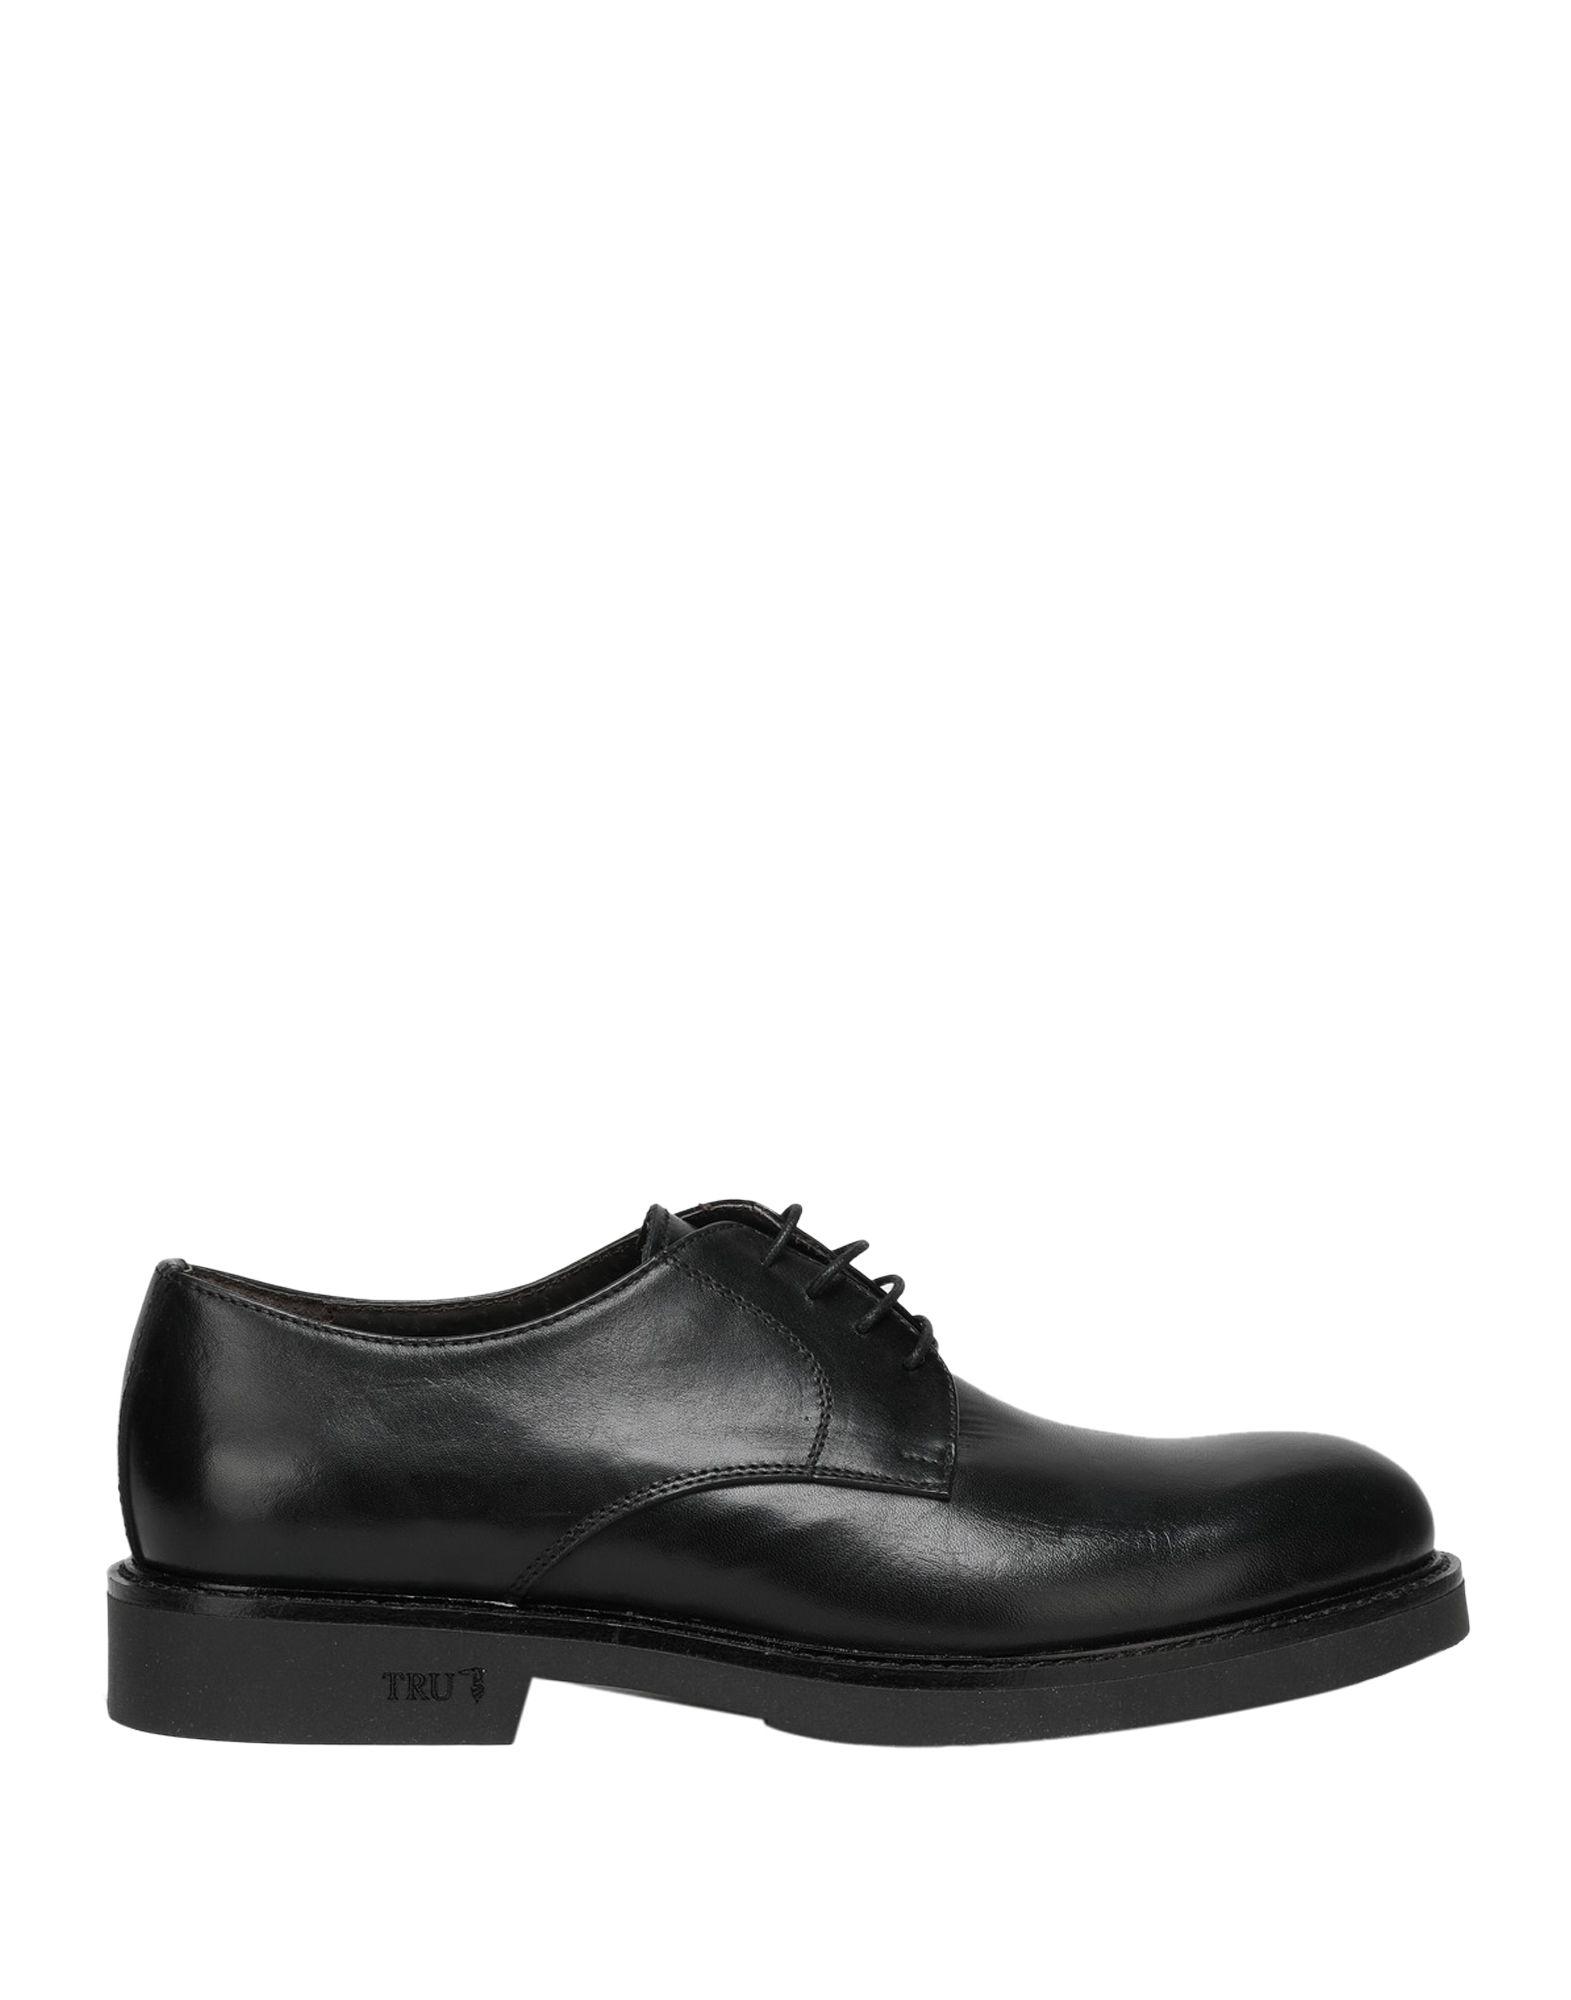 TRU TRUSSARDI Обувь на шнурках tru trussardi обувь на шнурках